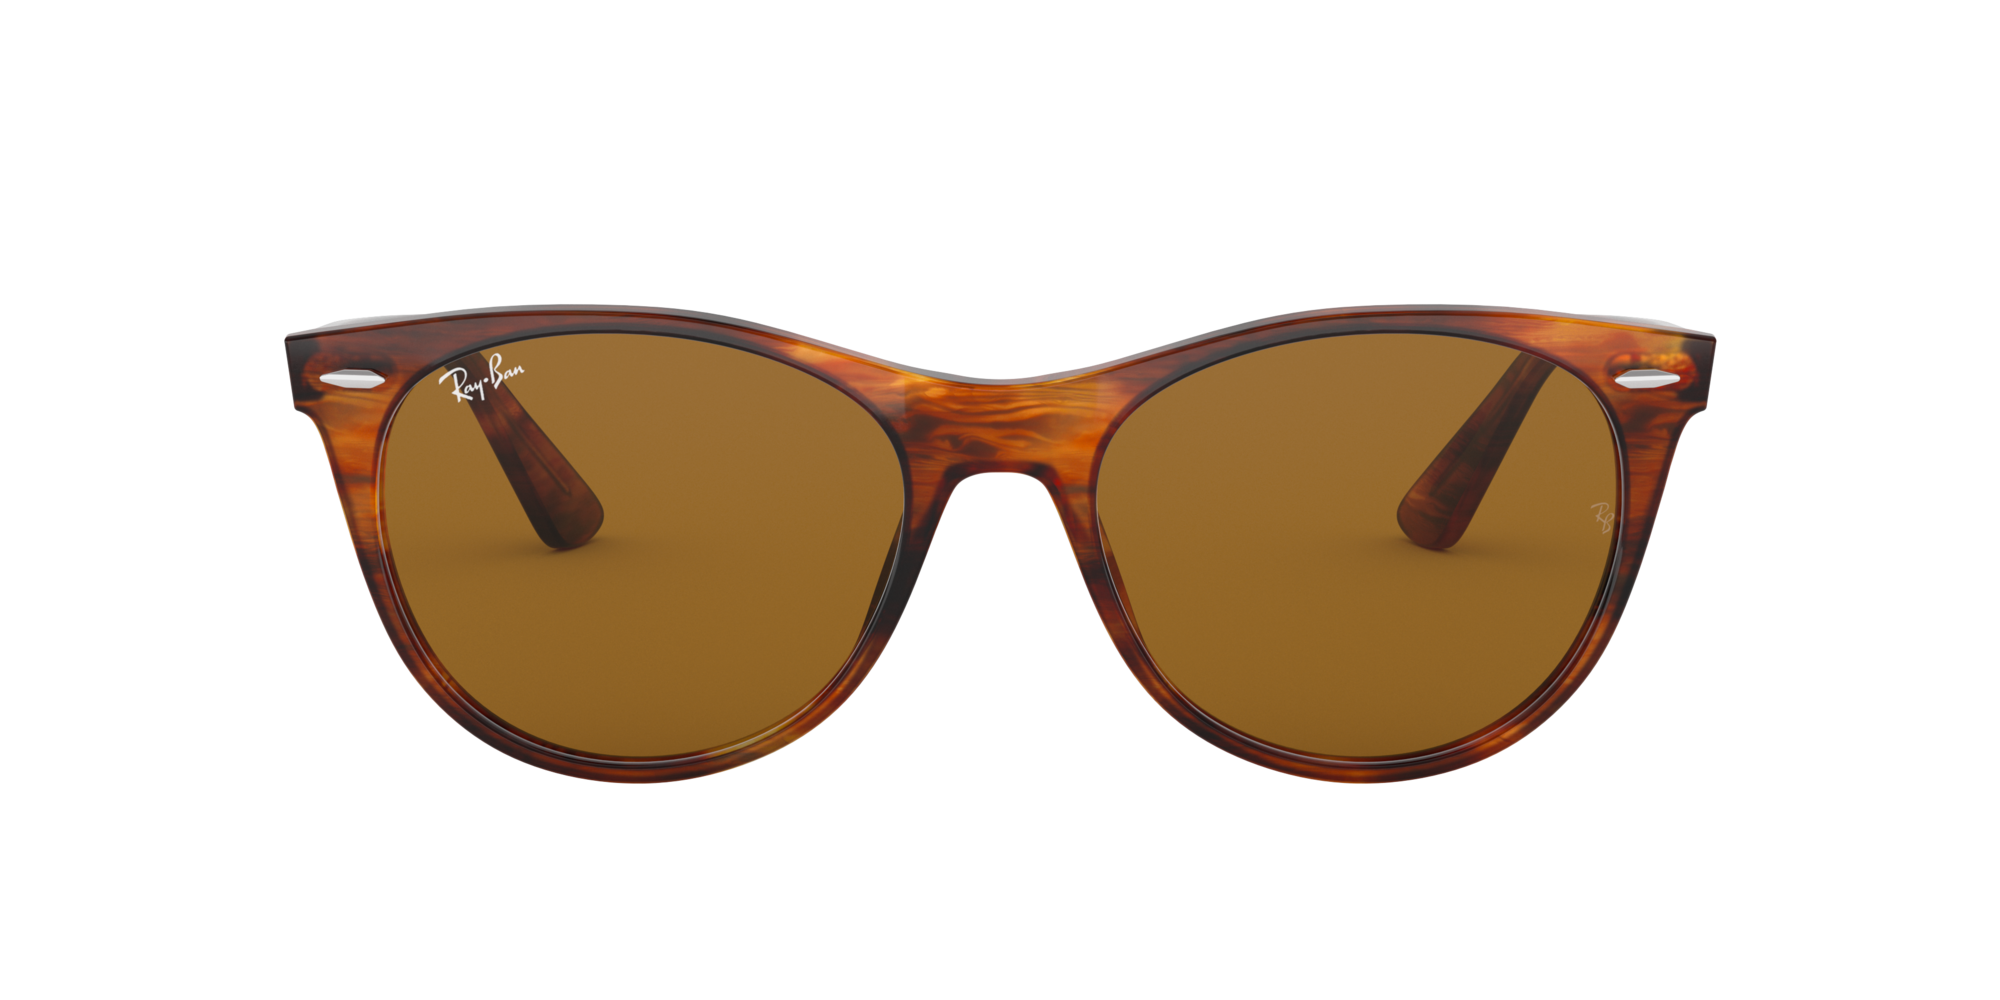 Image for RB2185 55 WAYFARER II from LensCrafters   Glasses, Prescription Glasses Online, Eyewear